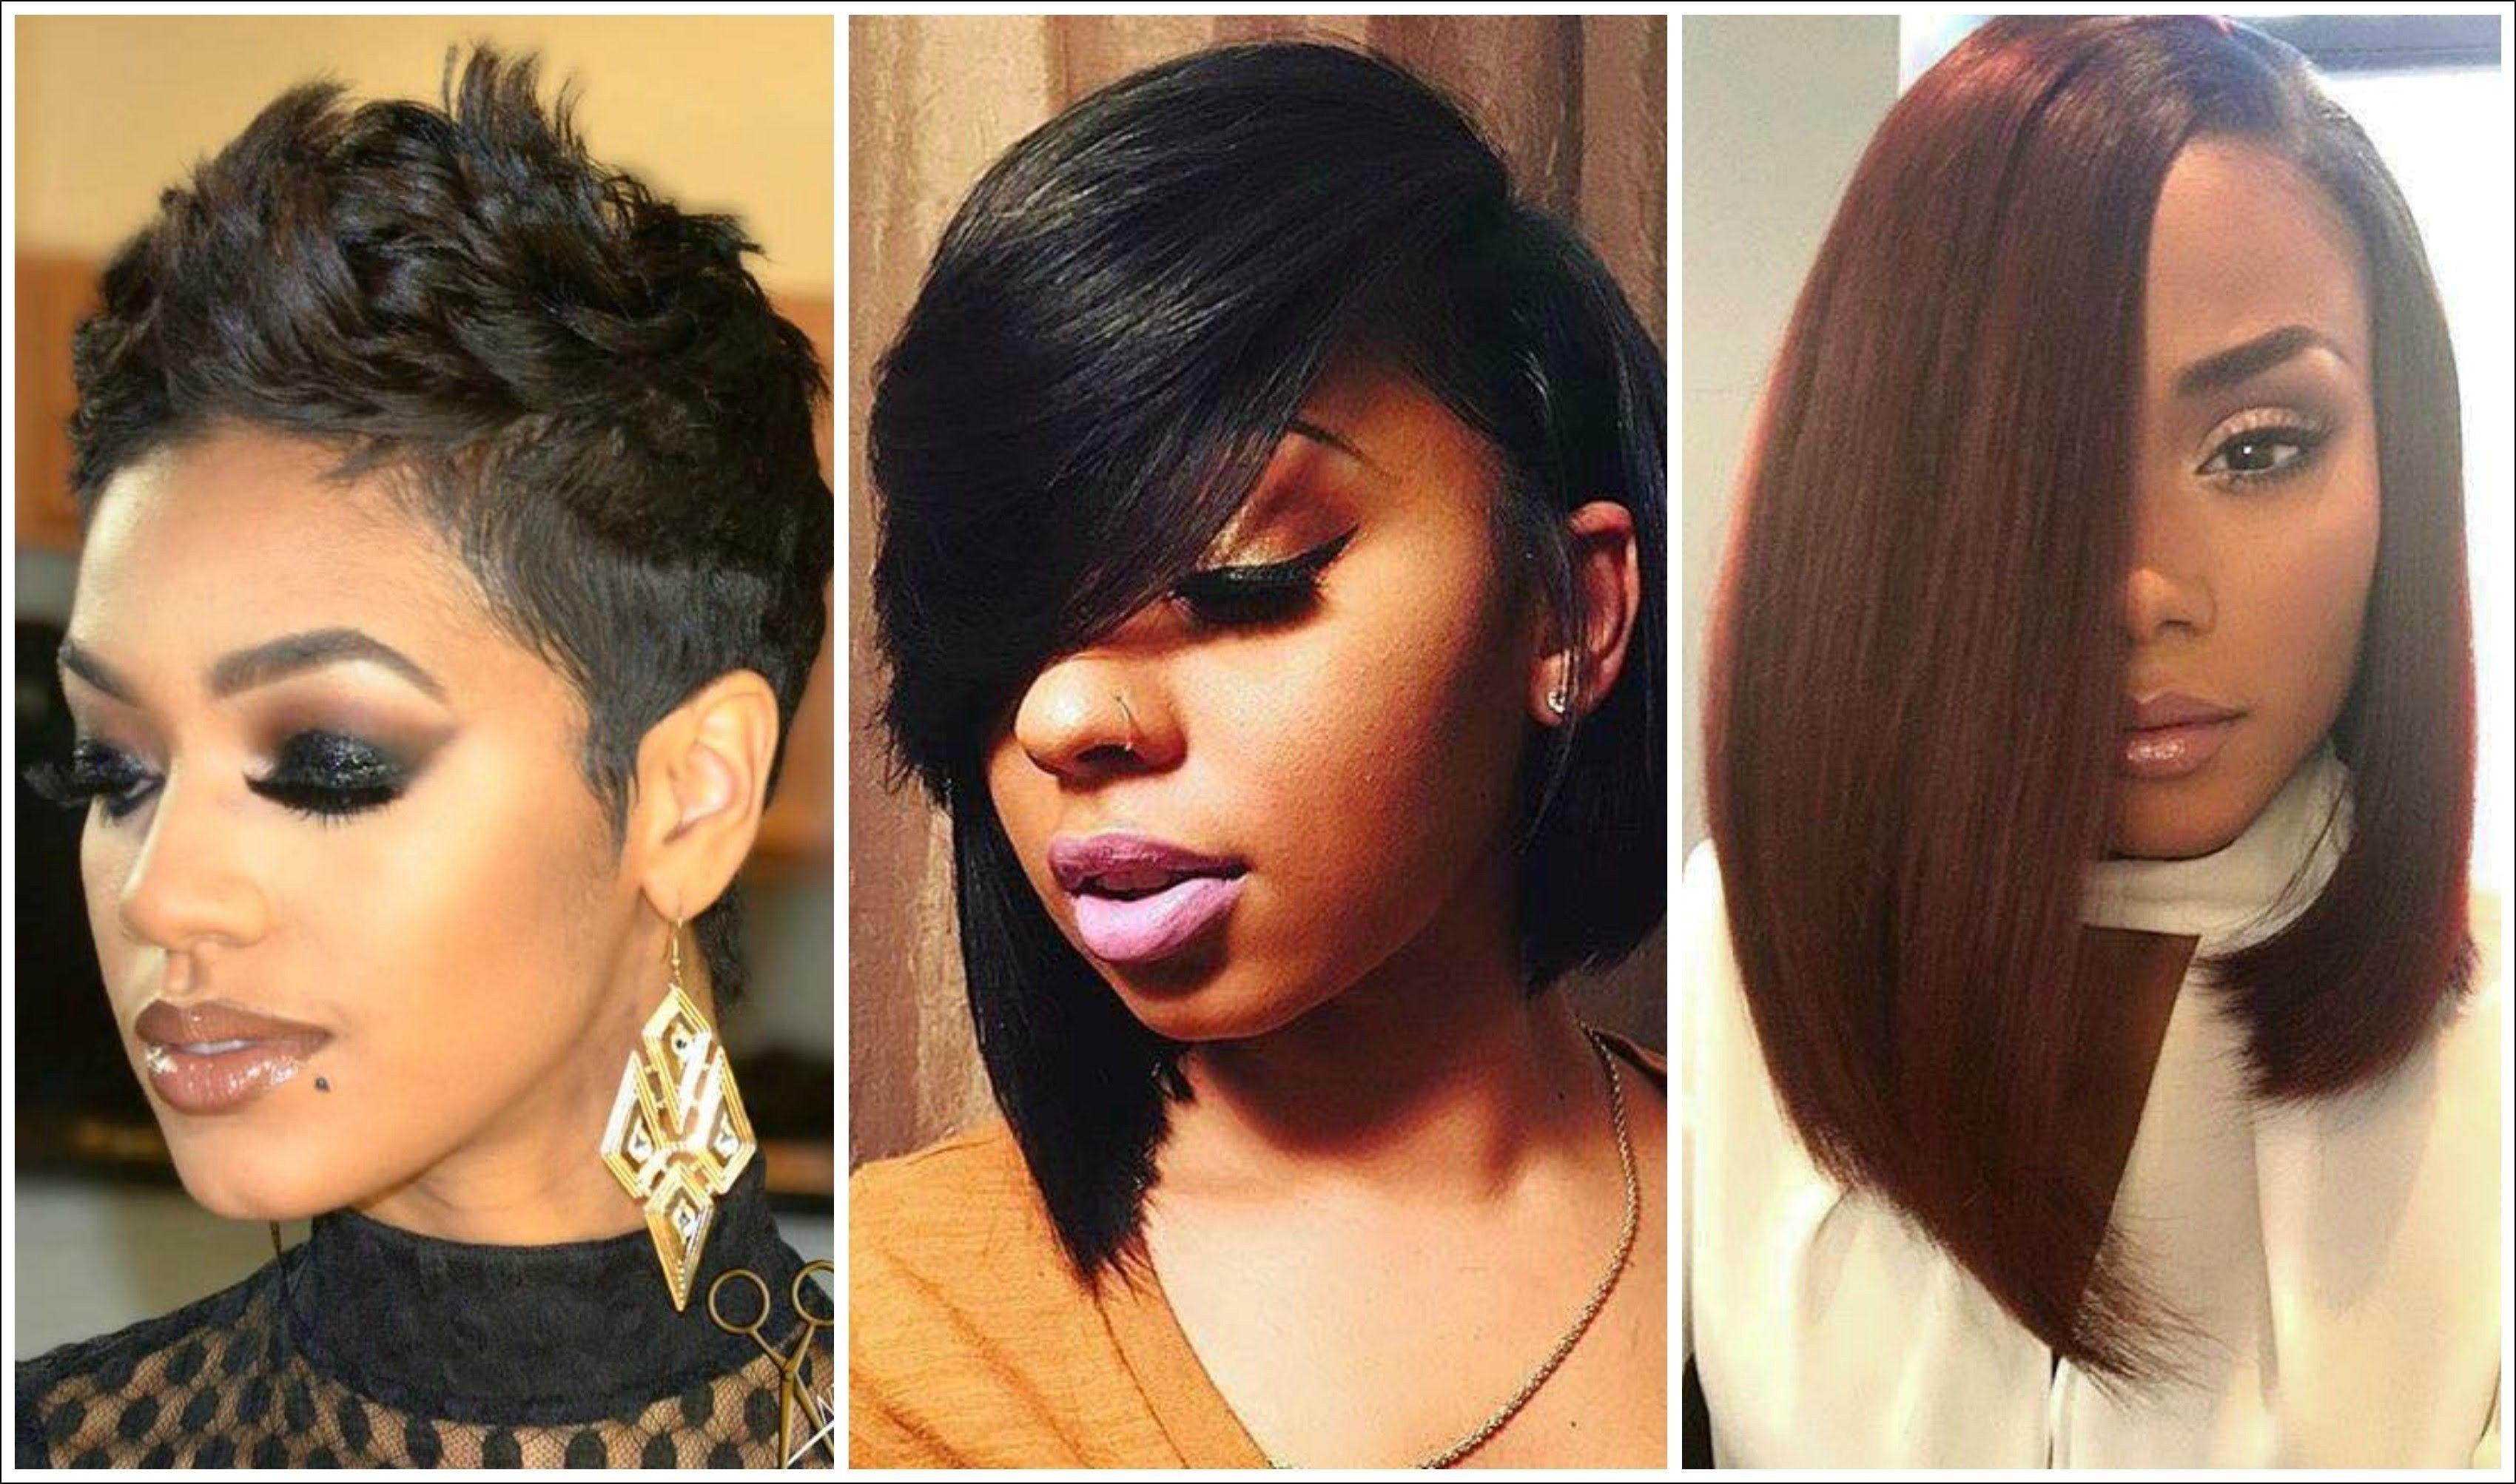 Bob Haircuts African American Women | That hair though ...